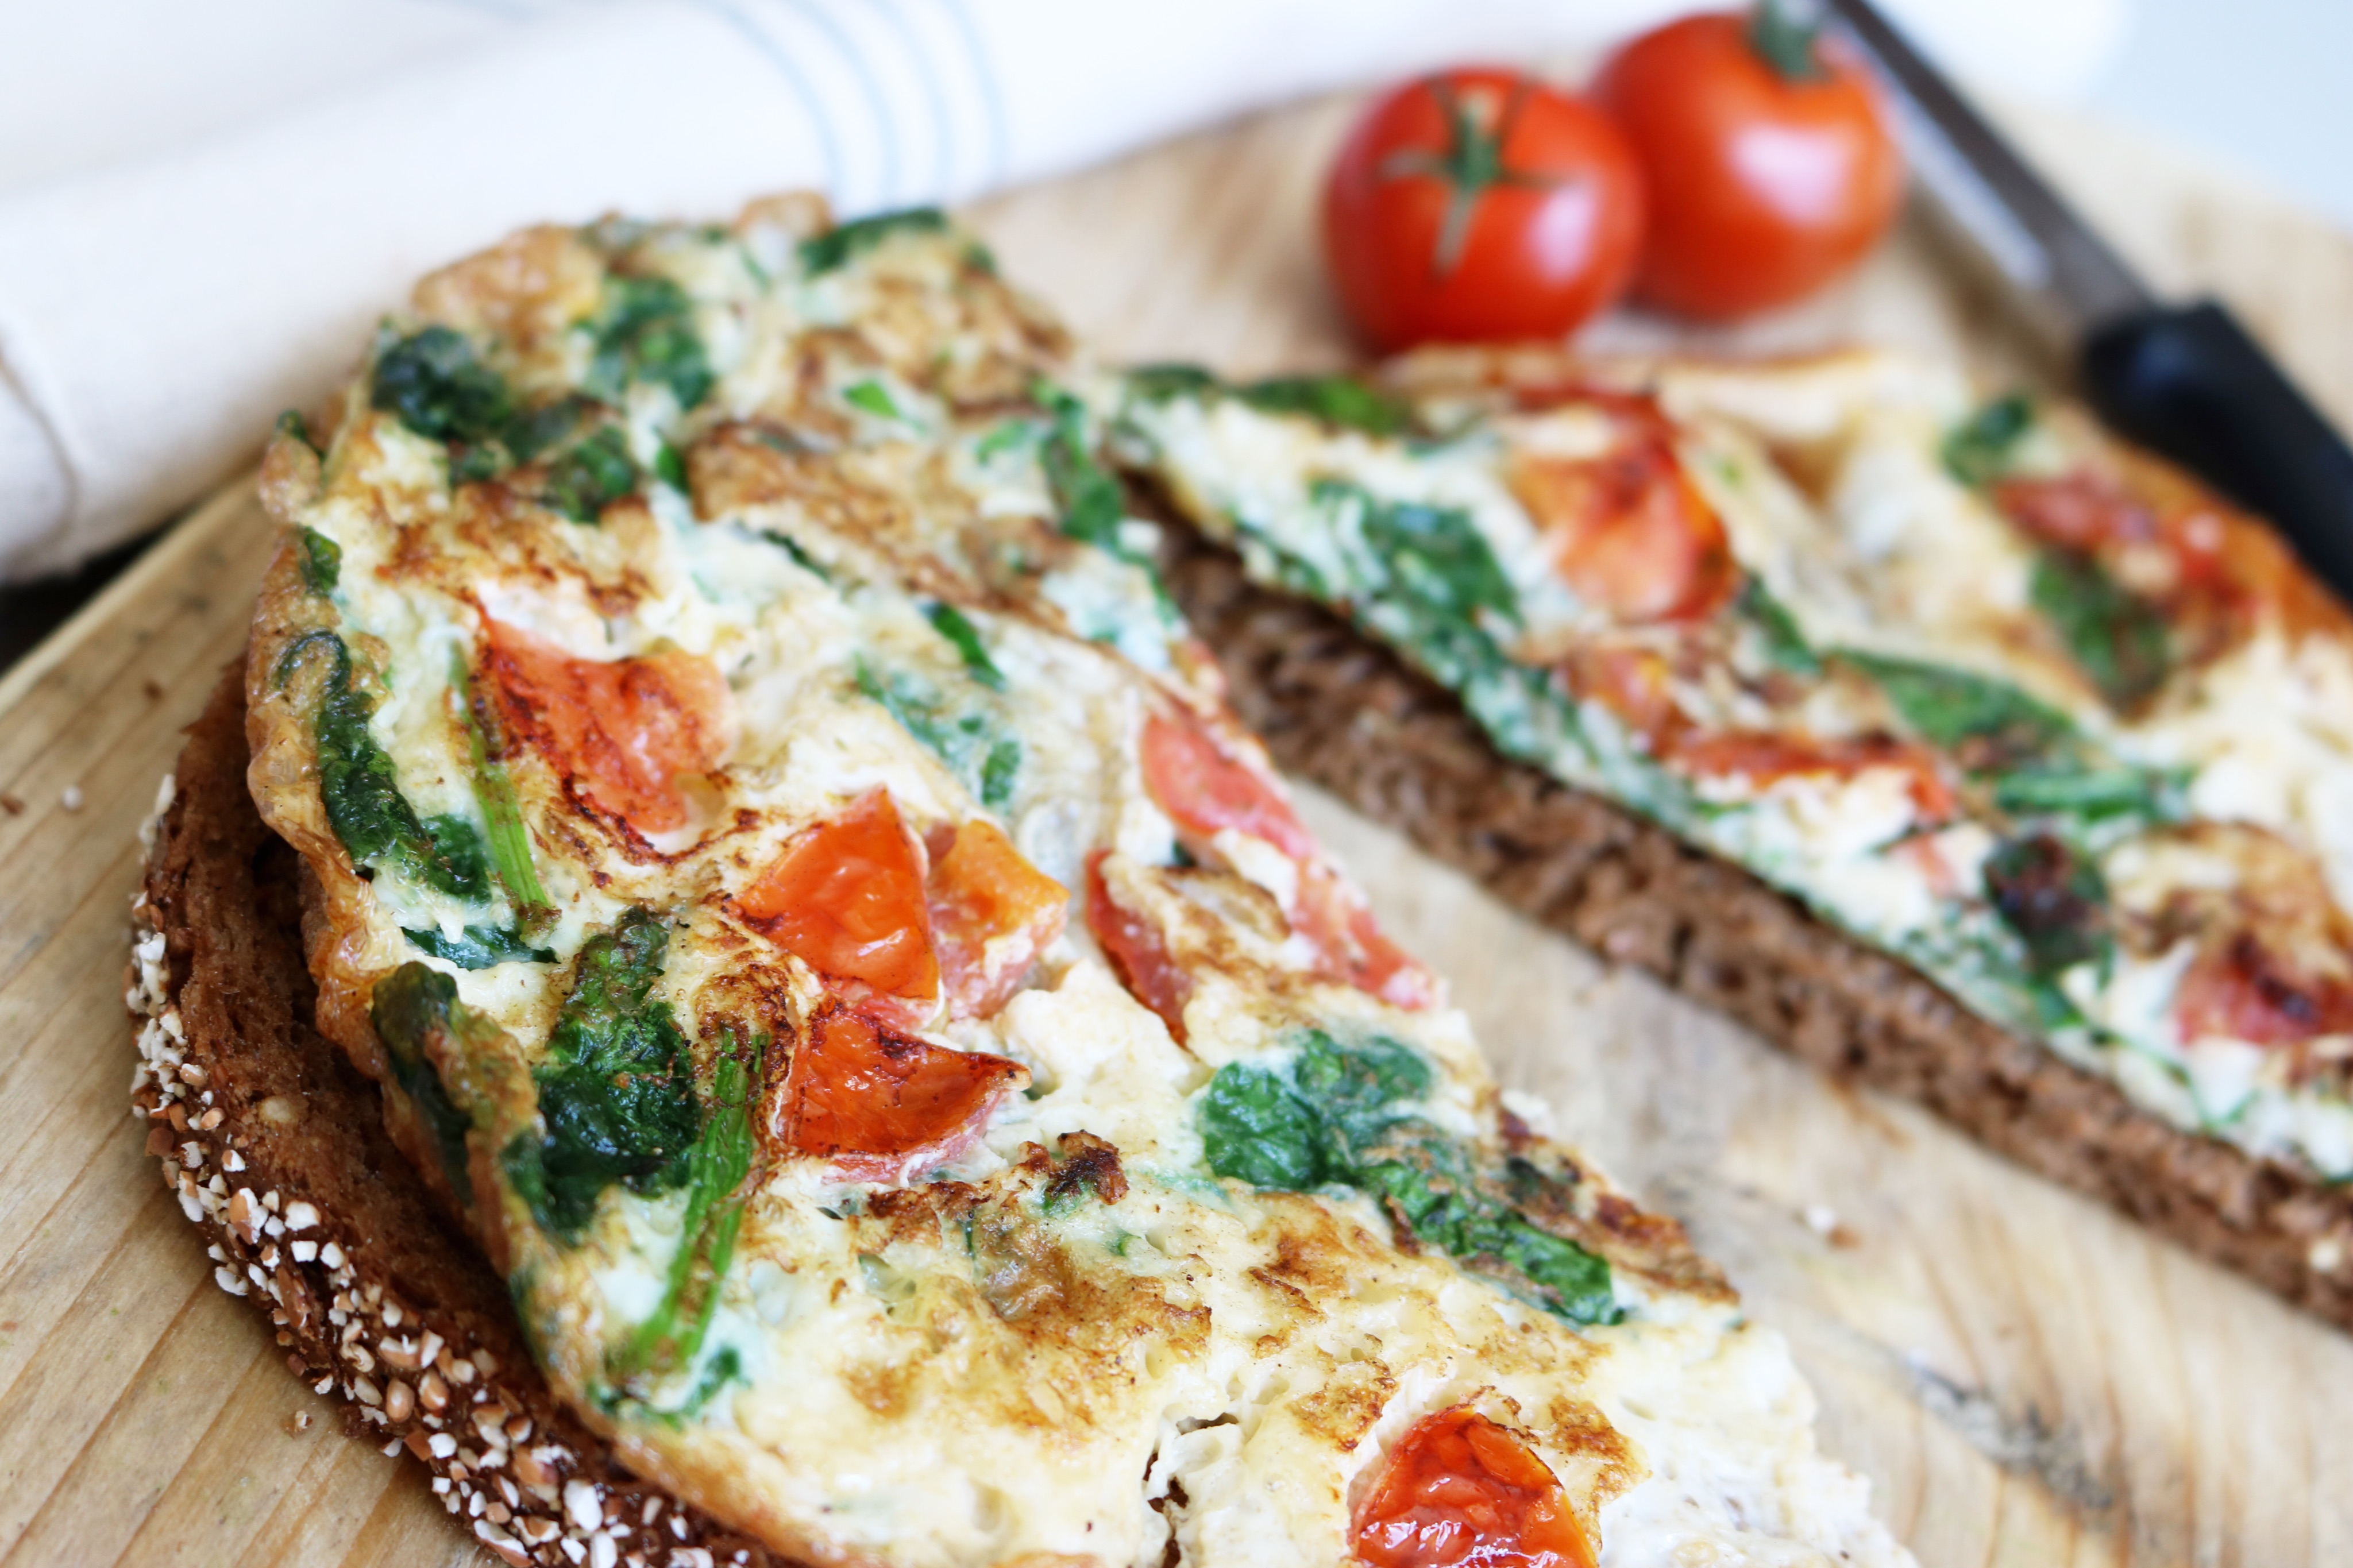 how to make a veggie omelette easy